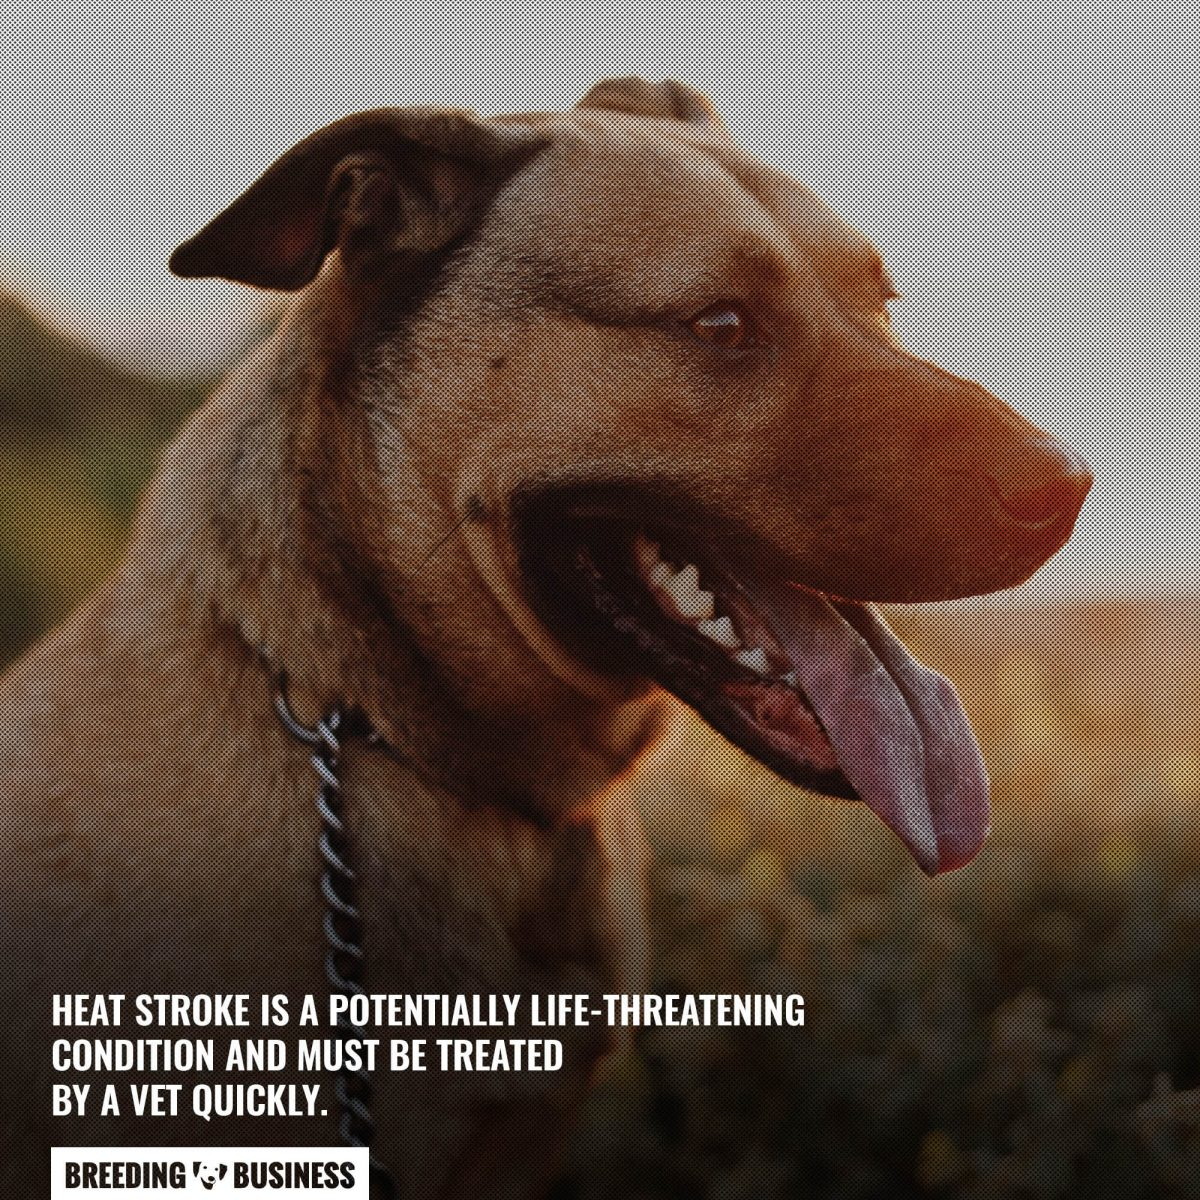 heat stroke is life threatening